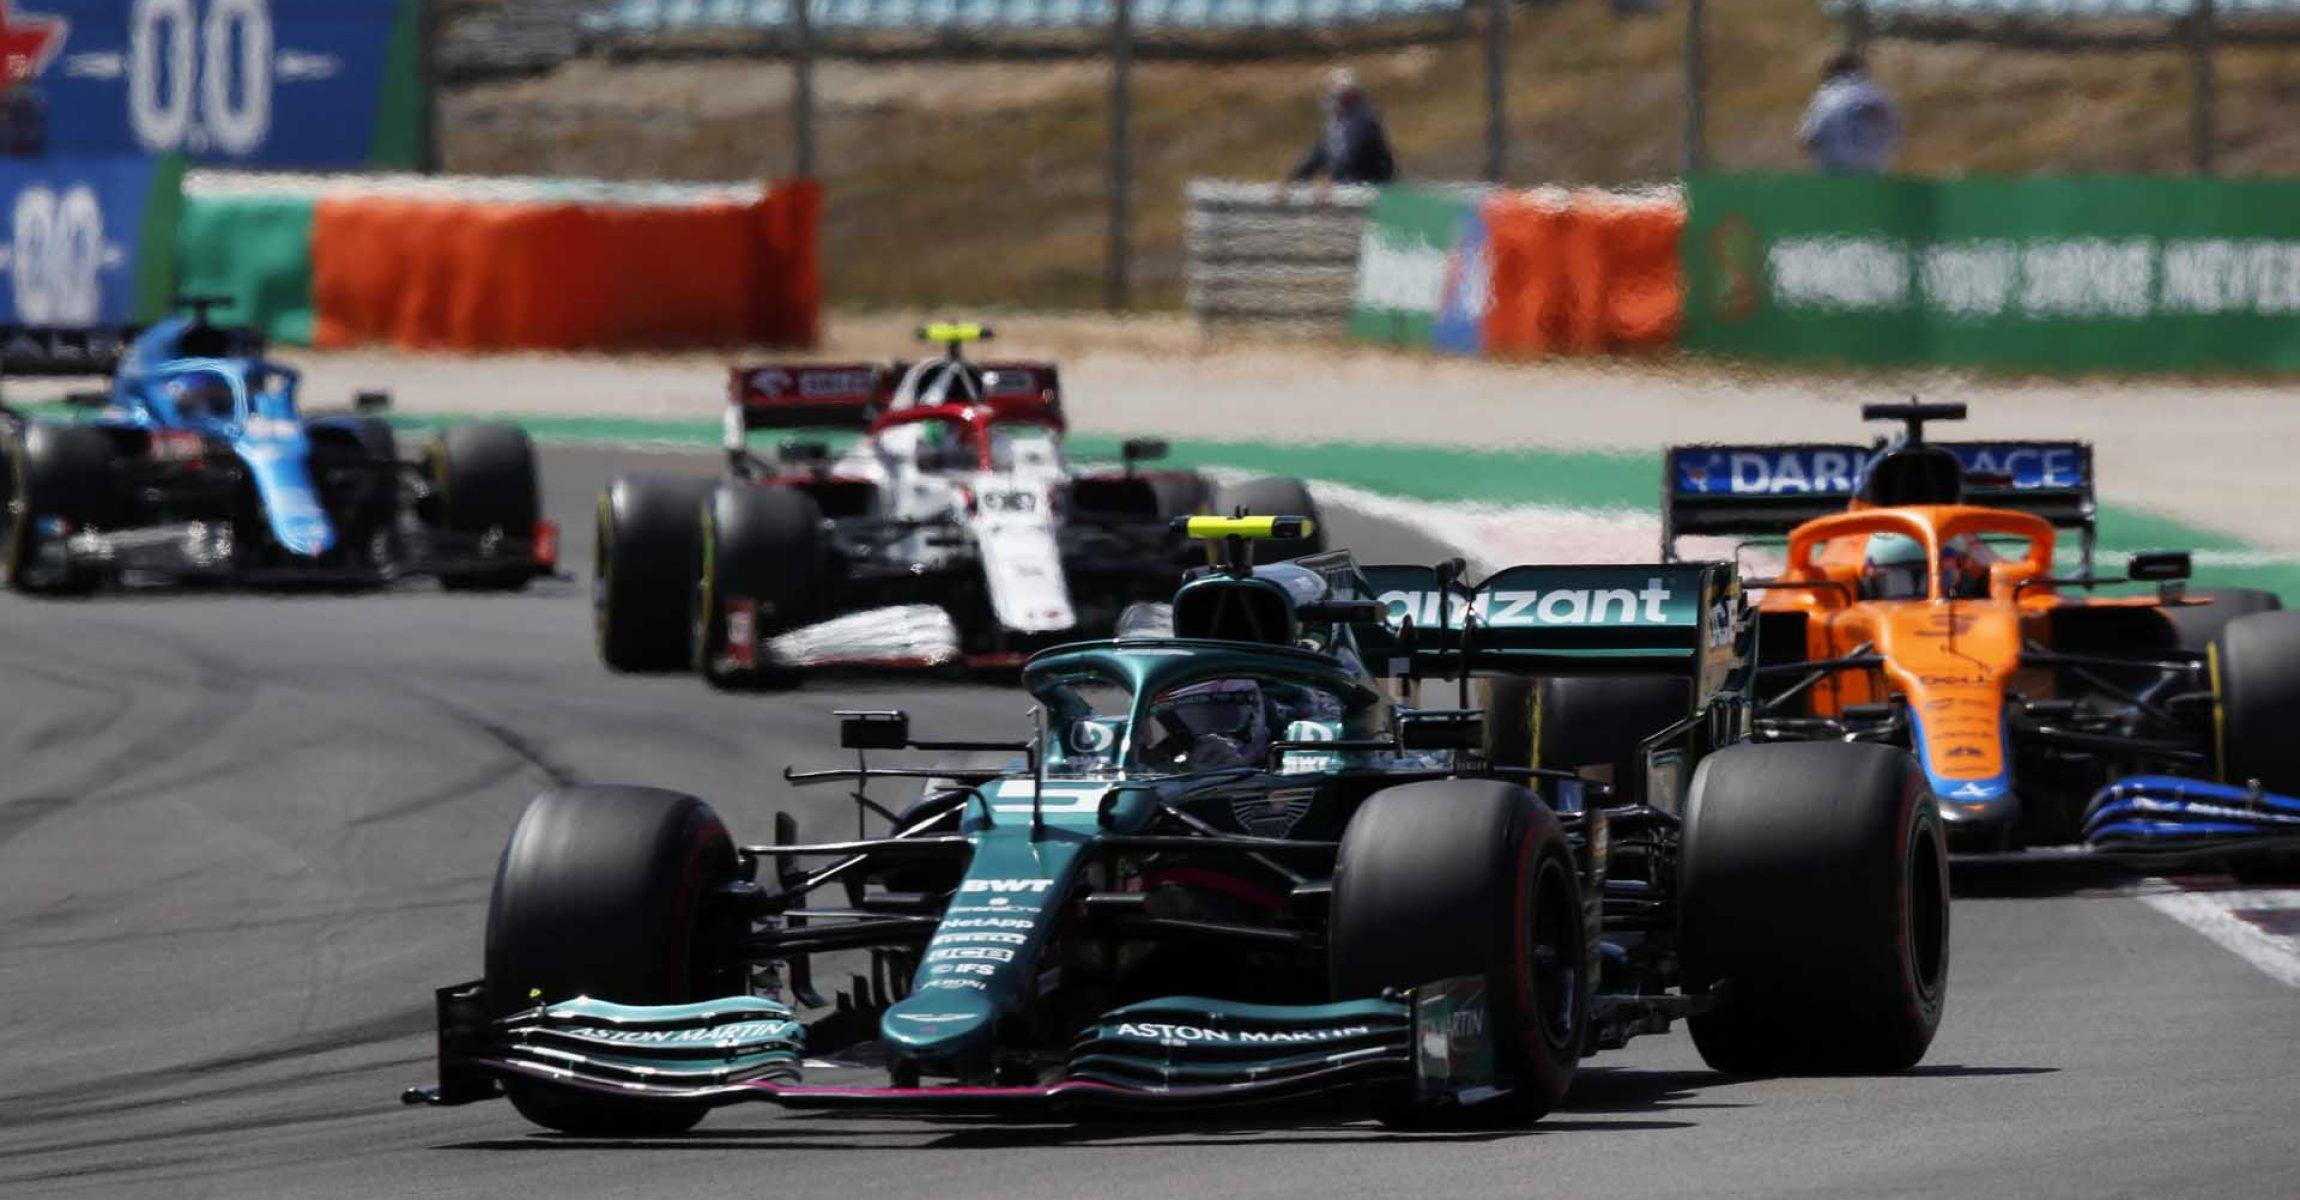 Sebastian Vettel, Aston Martin AMR21, leads Daniel Ricciardo, McLaren MCL35M, Antonio Giovinazzi, Alfa Romeo Racing C41, and Fernando Alonso, Alpine A521